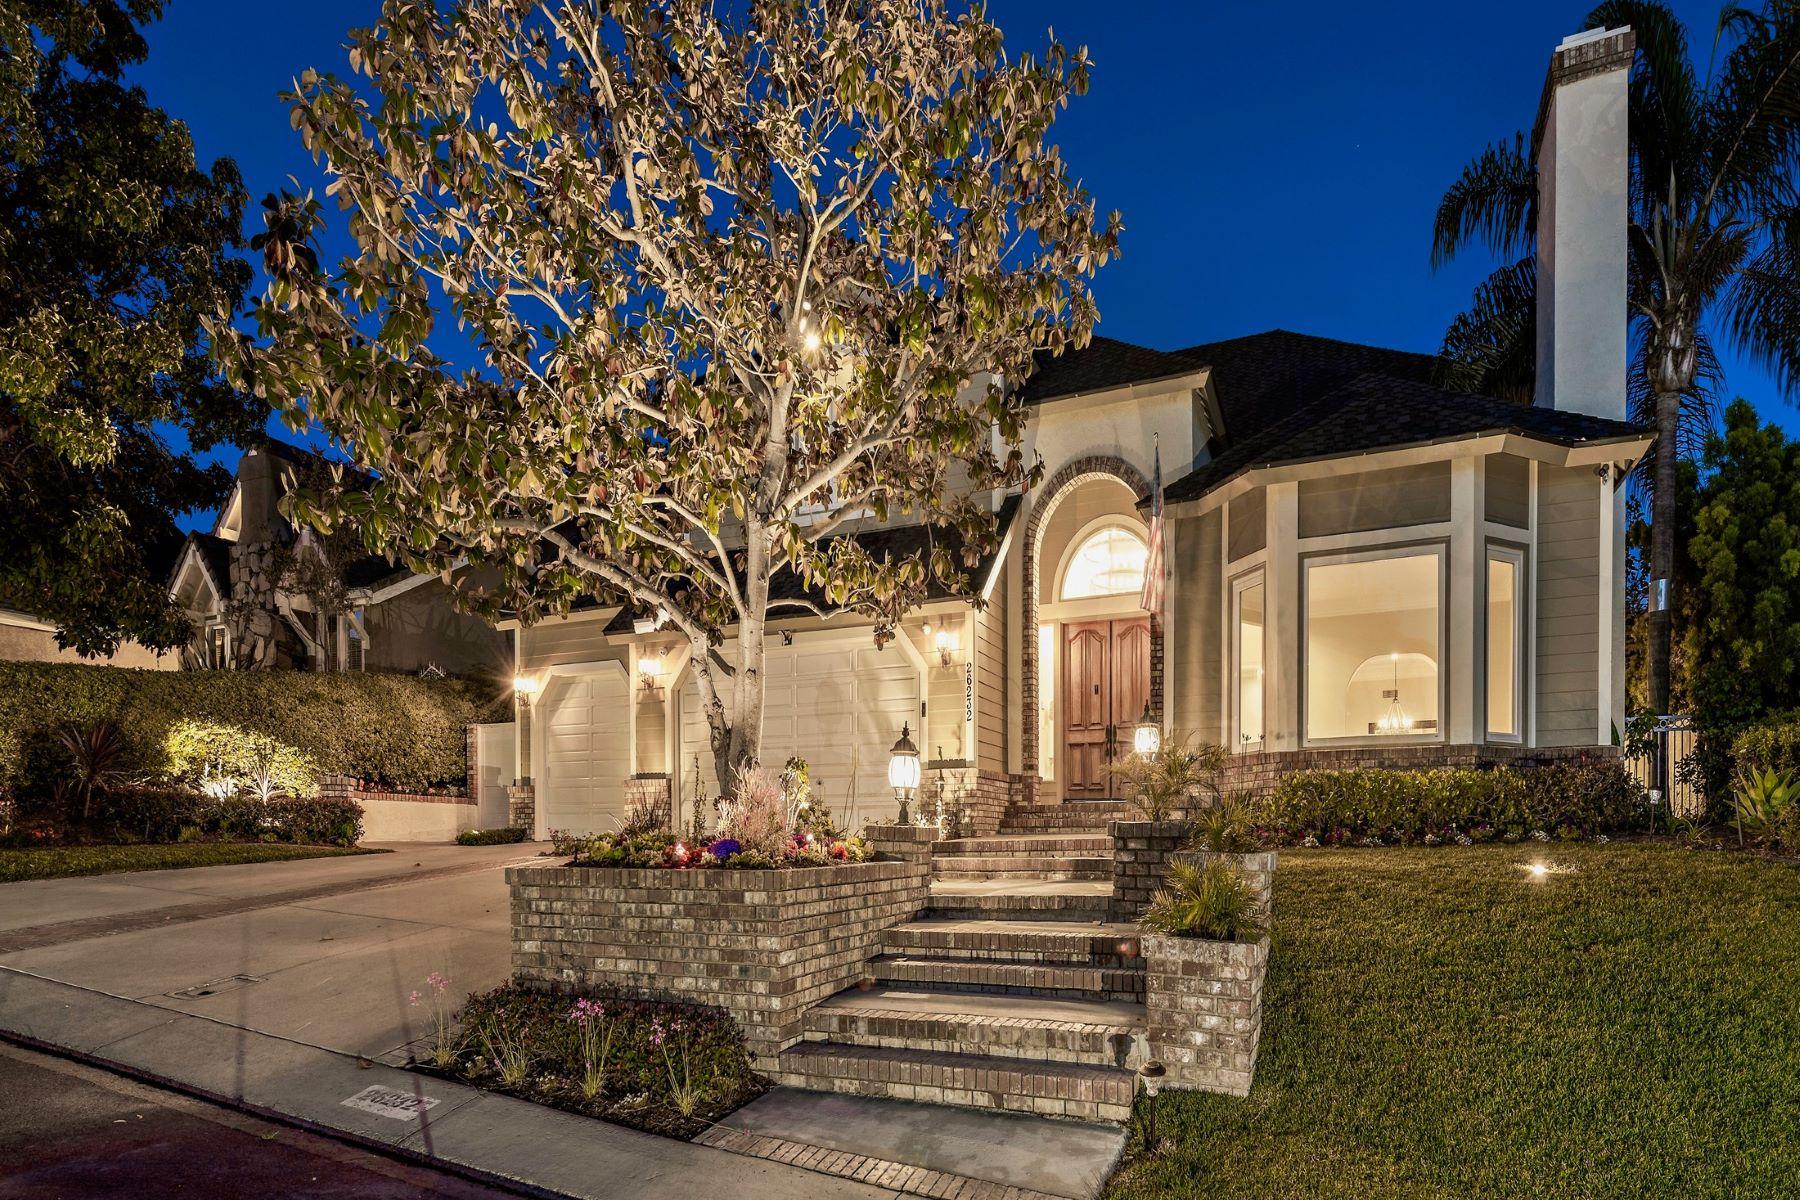 Single Family Homes for Sale at 26232 Mount Diablo Road Laguna Hills, California 92653 United States